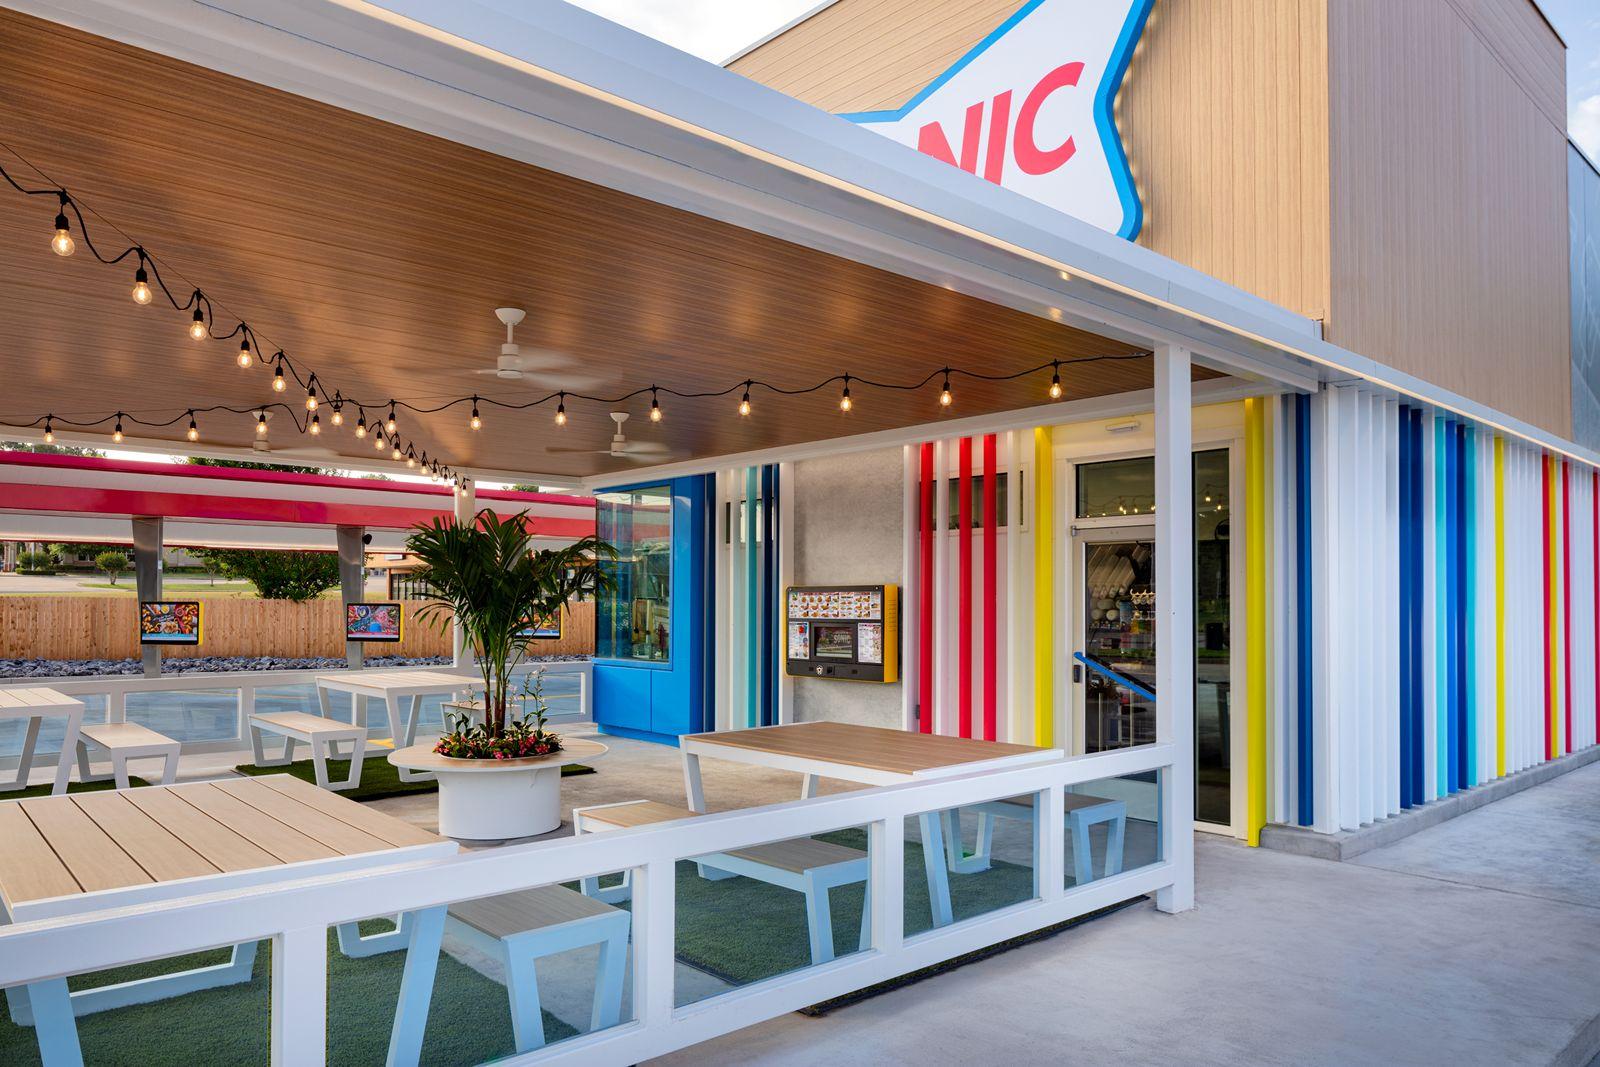 SONIC Unveils Bold New Restaurant Design